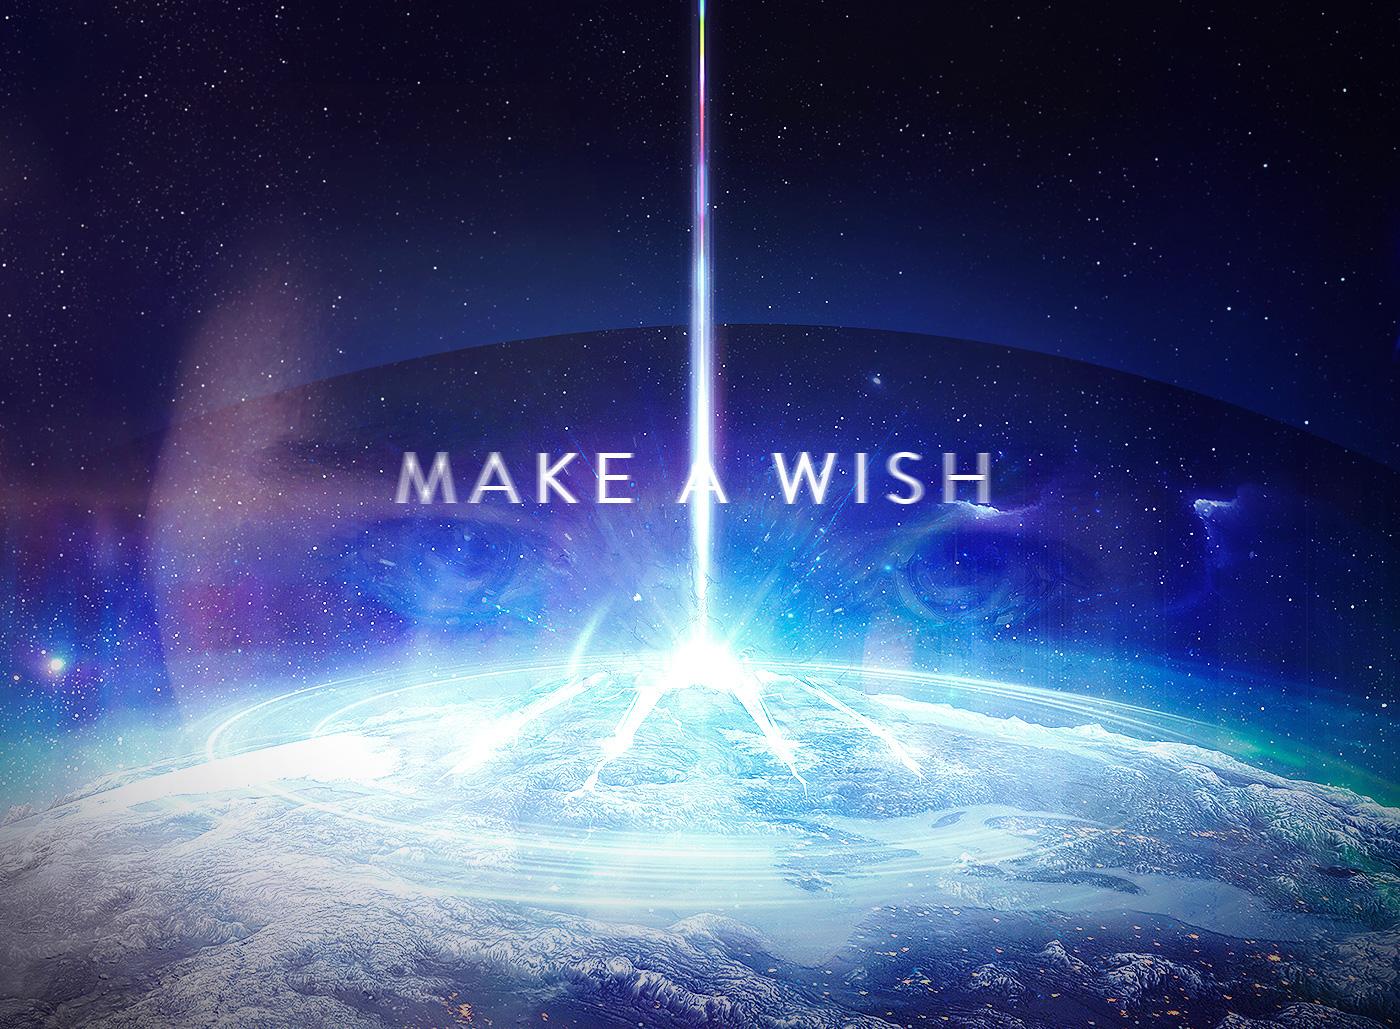 karim,KarimFakhoury,Fakhoury,make a wish,gravity,Space ,desktopography,wallpaper,astronaut,Montreal,photoshop,photomanipulation